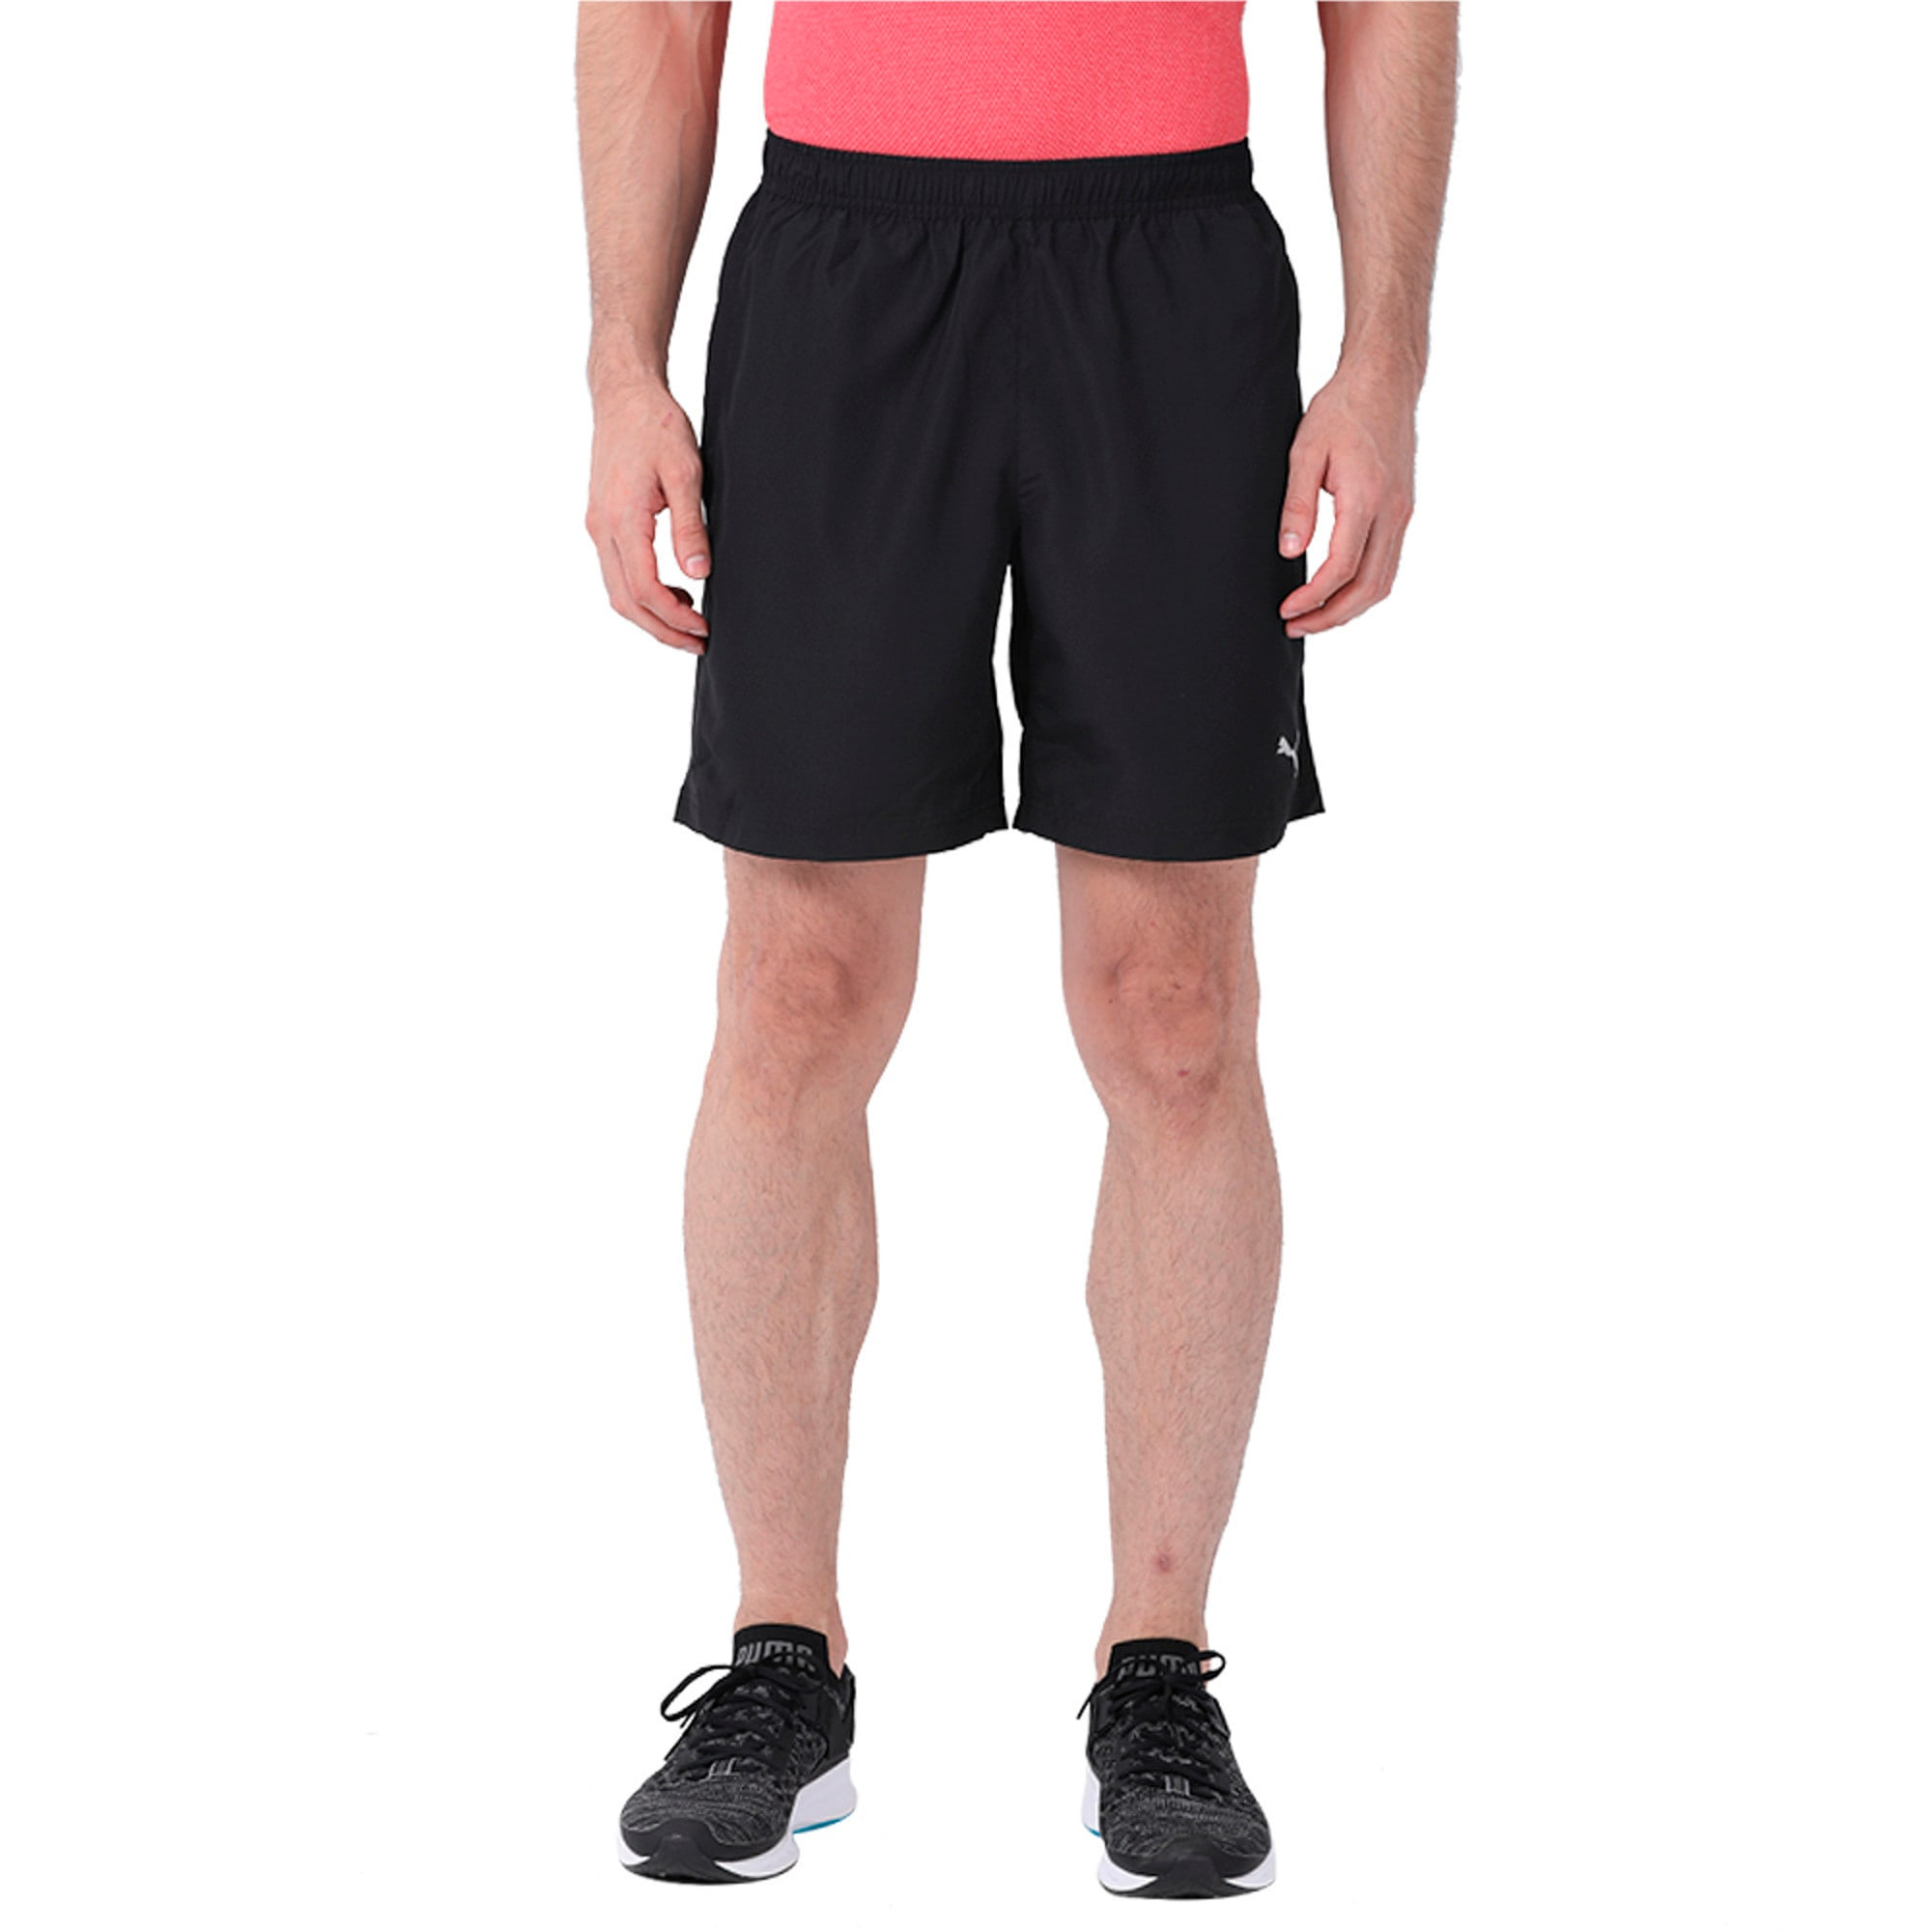 "Thumbnail 4 of Core-Run 7"" Shorts, Puma Black, medium-IND"